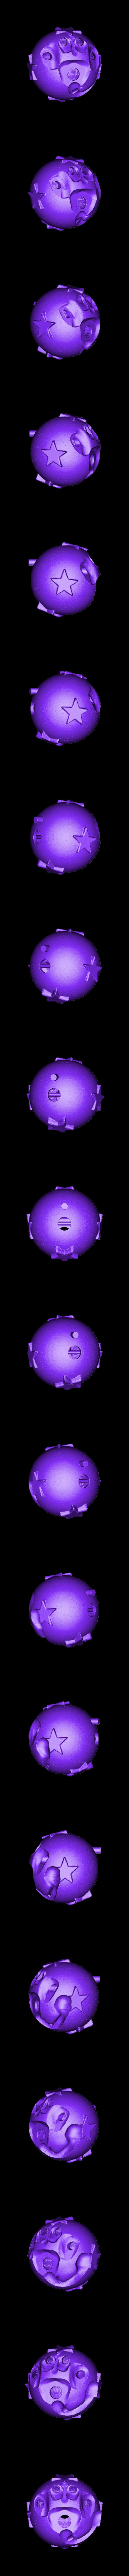 Lion_Ball_Lamp_Ball.obj Download free OBJ file Lion On Ball Nighlight/Lamp • 3D printable template, Pza4Rza